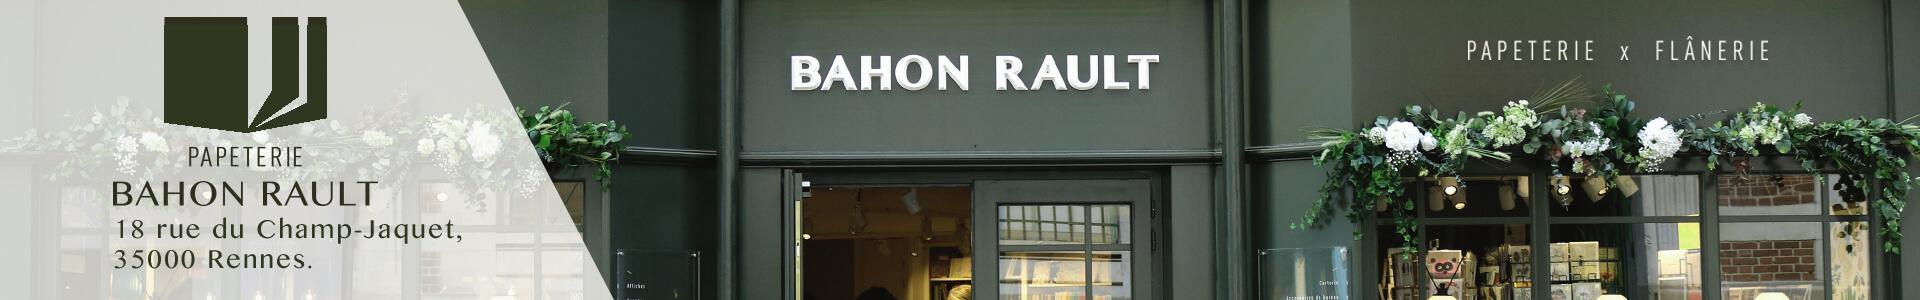 Papeterie BAHON RAULT